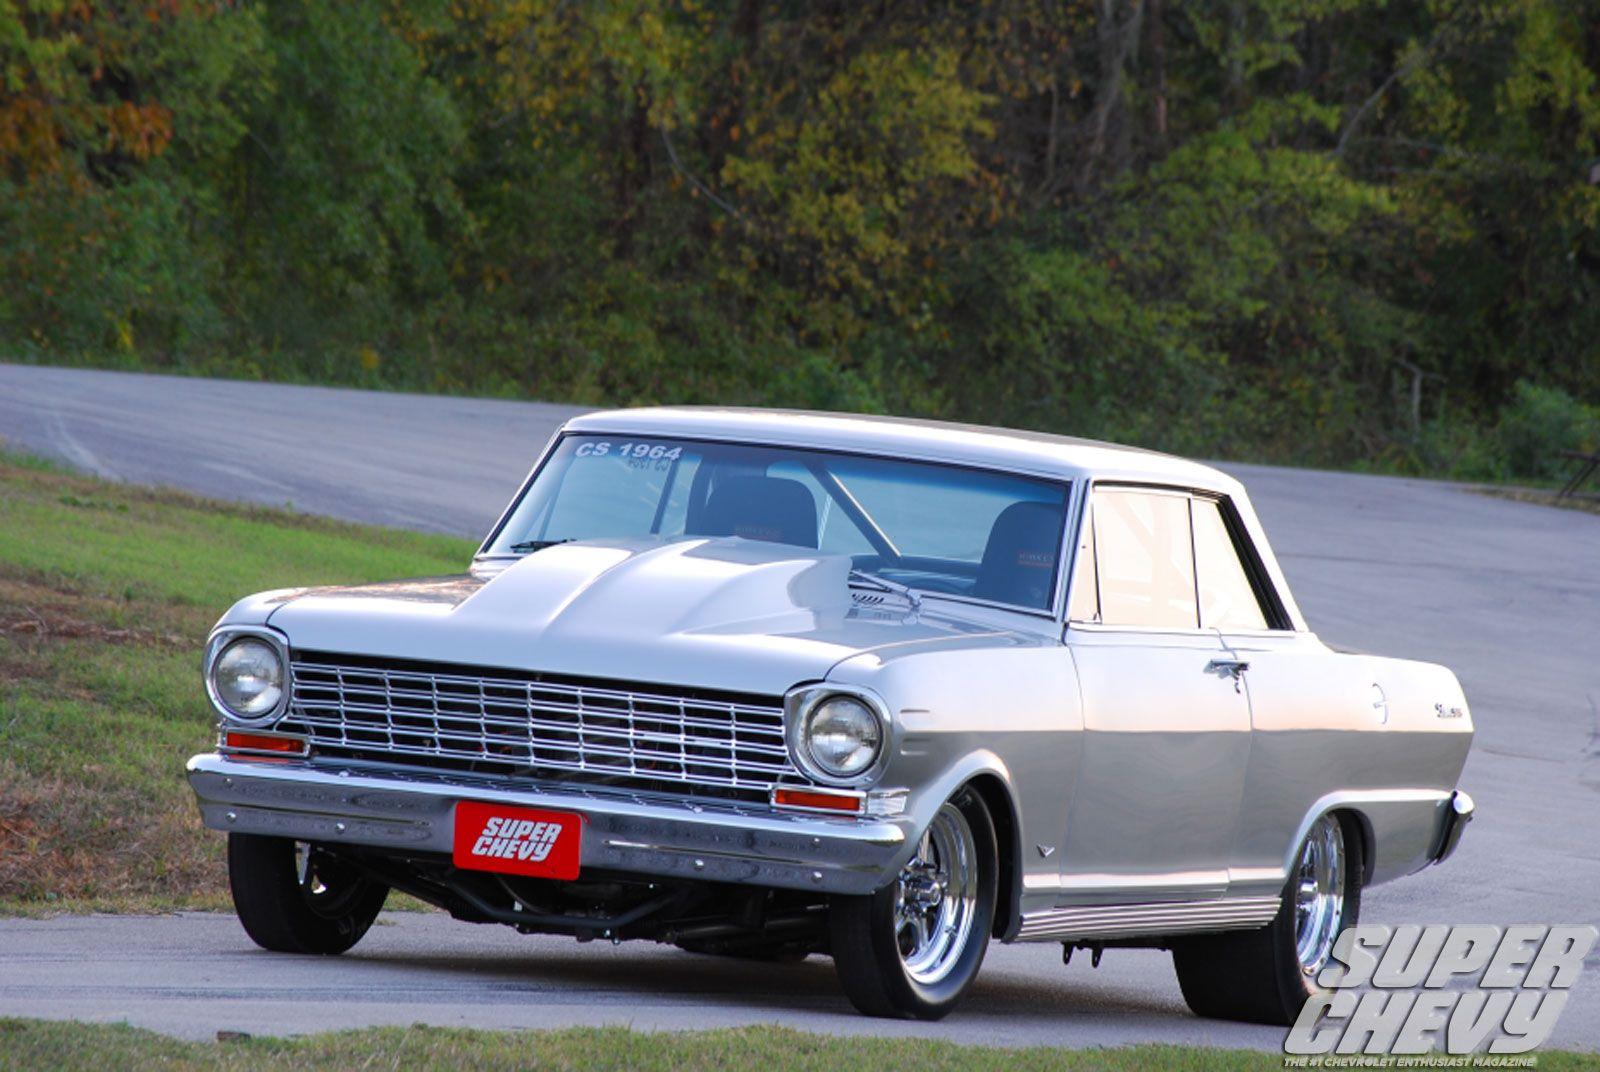 1965 chevy ii nova ss favorite cars american muscle pinterest - 1964 Chevy Nova Sucp 1108 02 1964 Chevrolet Nova Ii